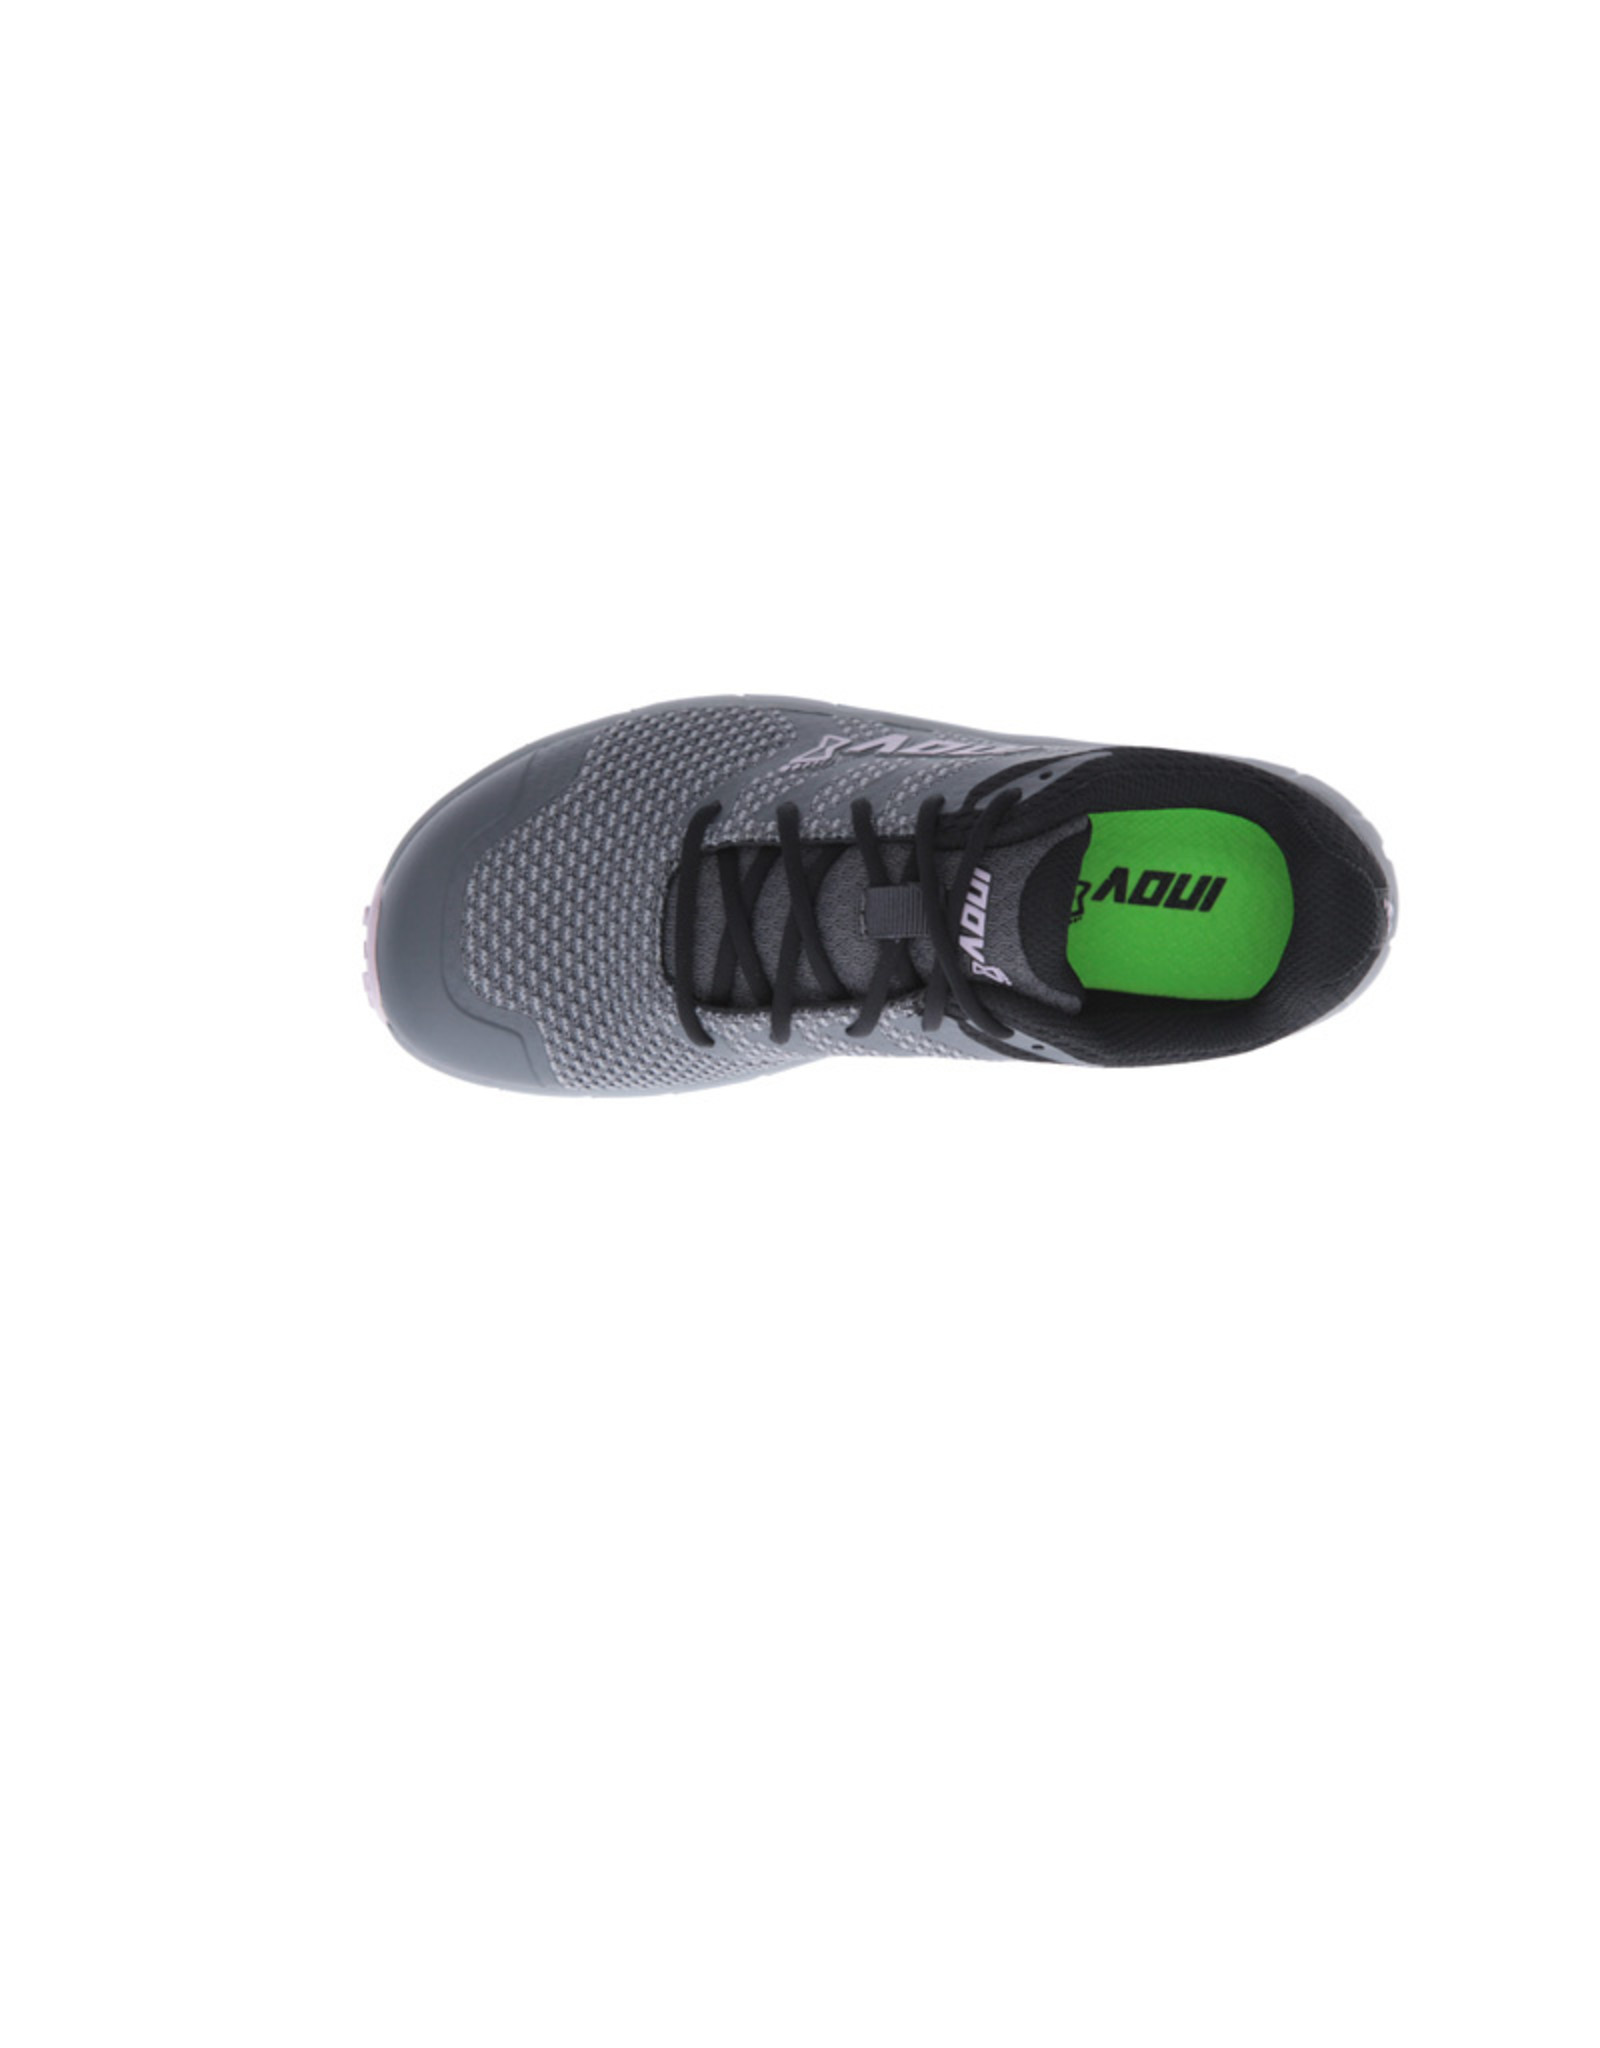 Inov-8 Parkclaw 260 Knit Trailrunning Schoen - Grijs/Zwart